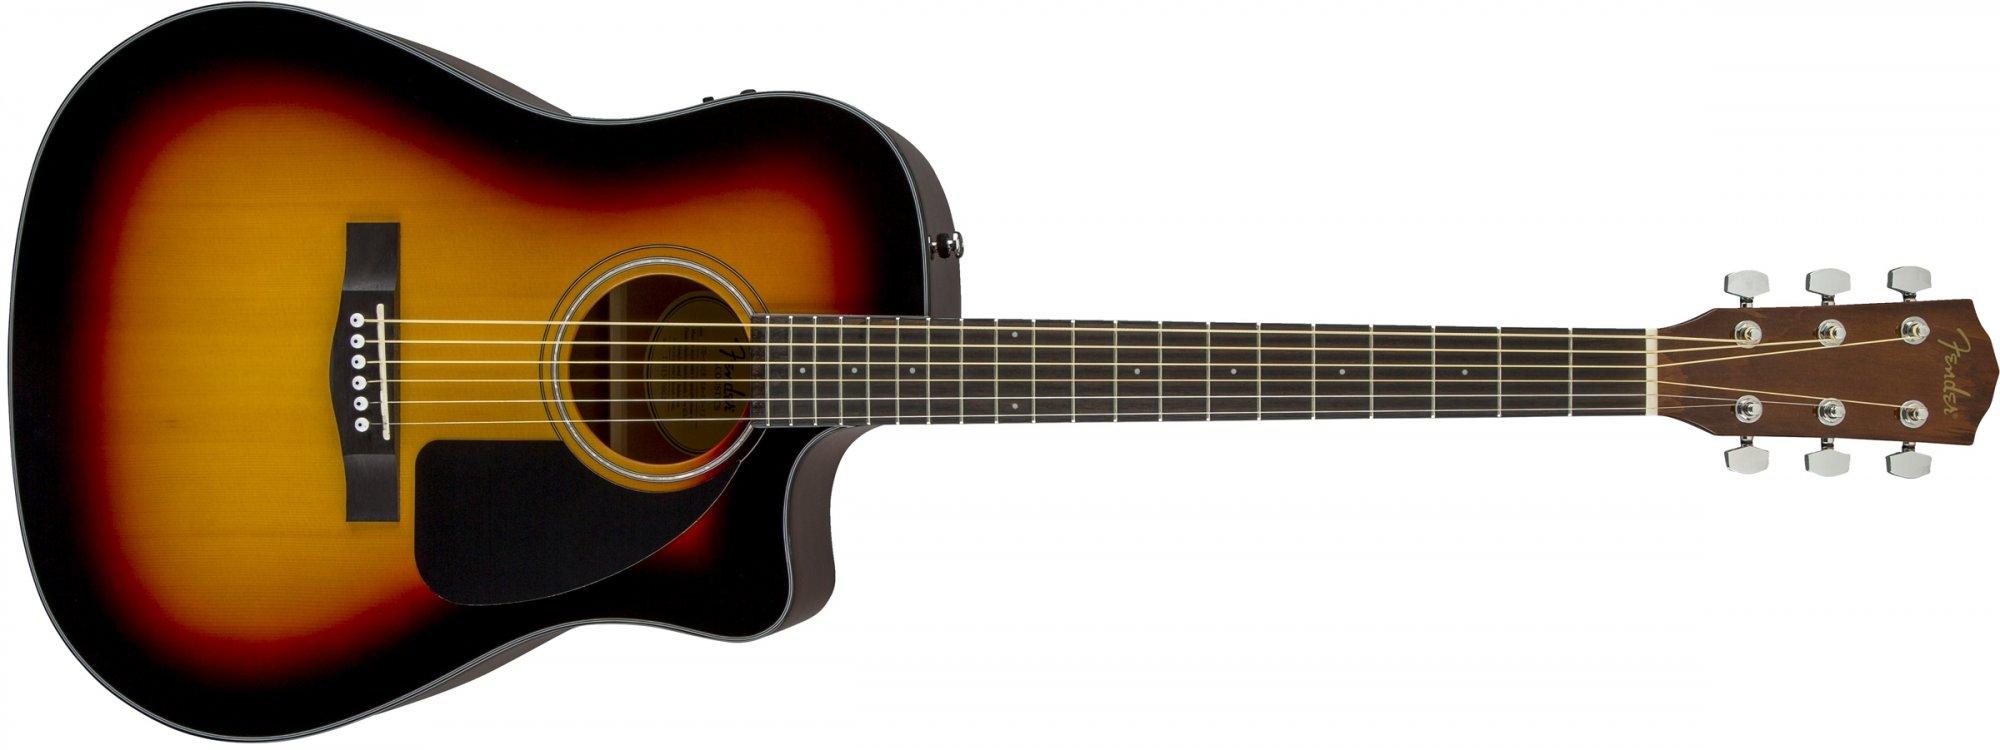 Fender CD-60CE Acoustic Electric Guitar Sunburst with Hard Case